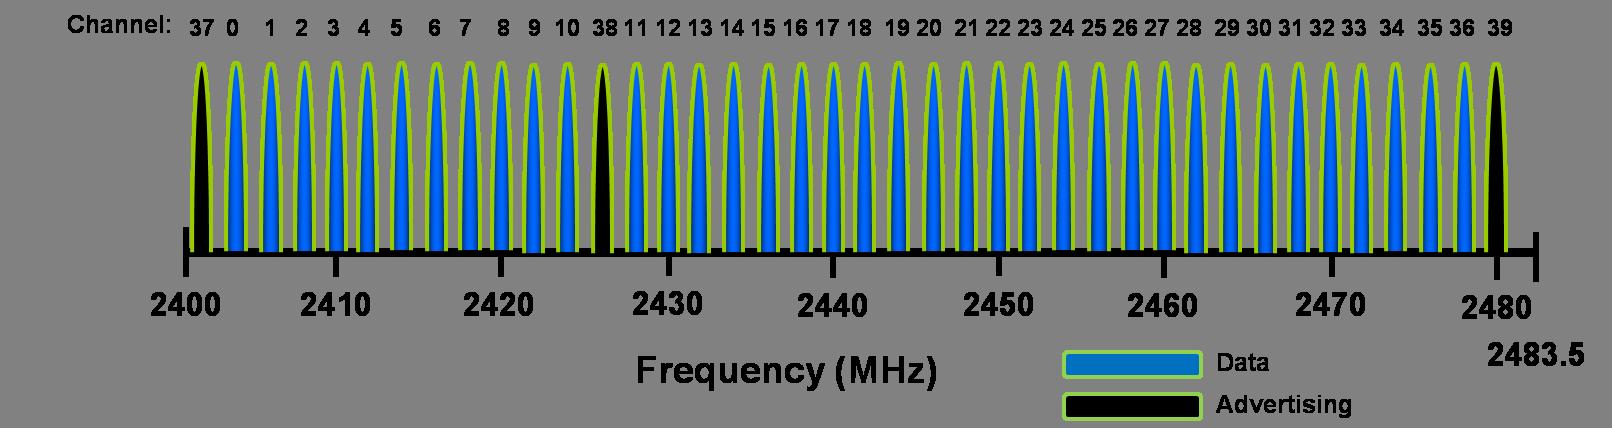 Bluetooth® Low Energy Channels - Developer Help